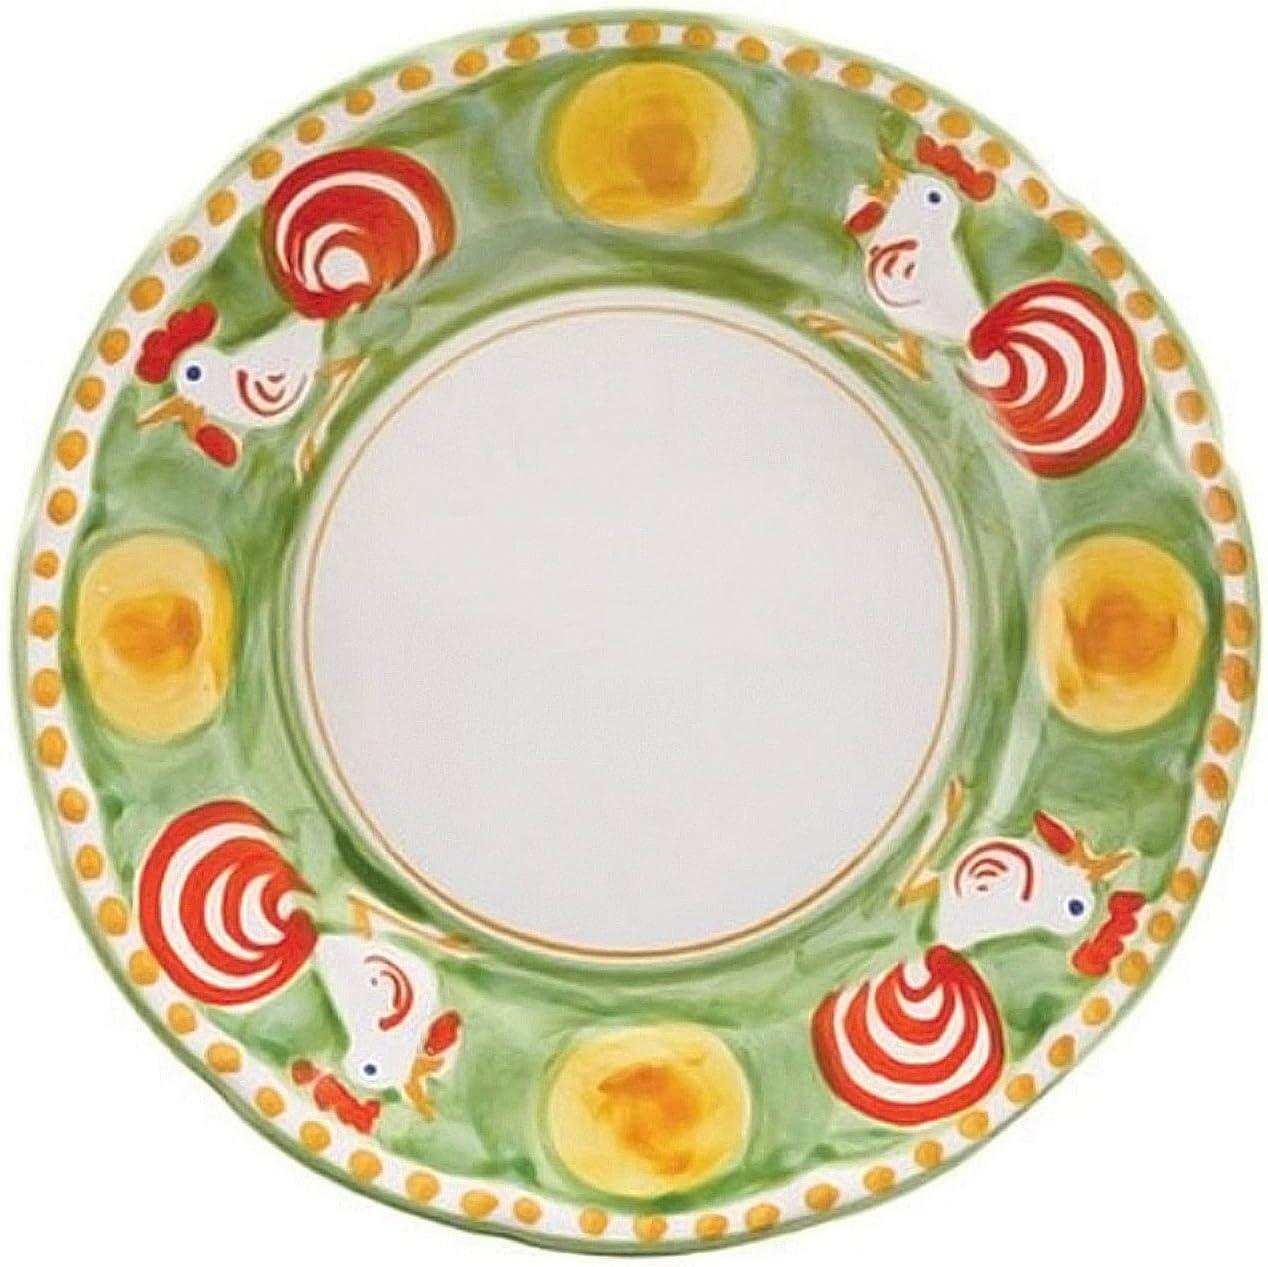 Vietri Gallina Genuine Dinner Portland Mall Plate - Collection Campagna